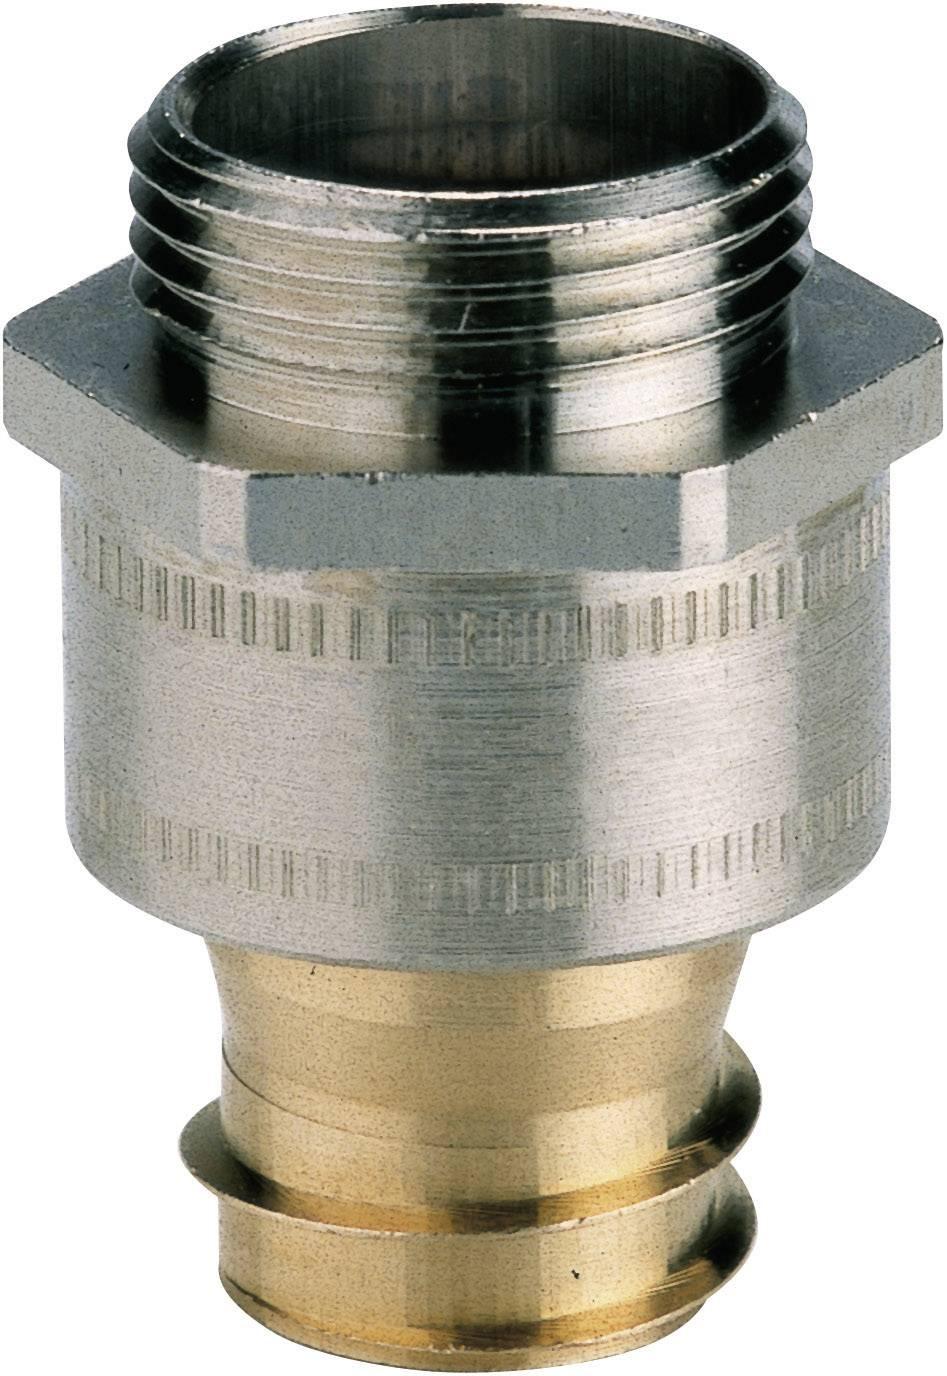 Hadicová spojka rovná LAPP SILVYN® LI-M 20x1,5 SGY 61802372, M20, stříbrná, 1 ks